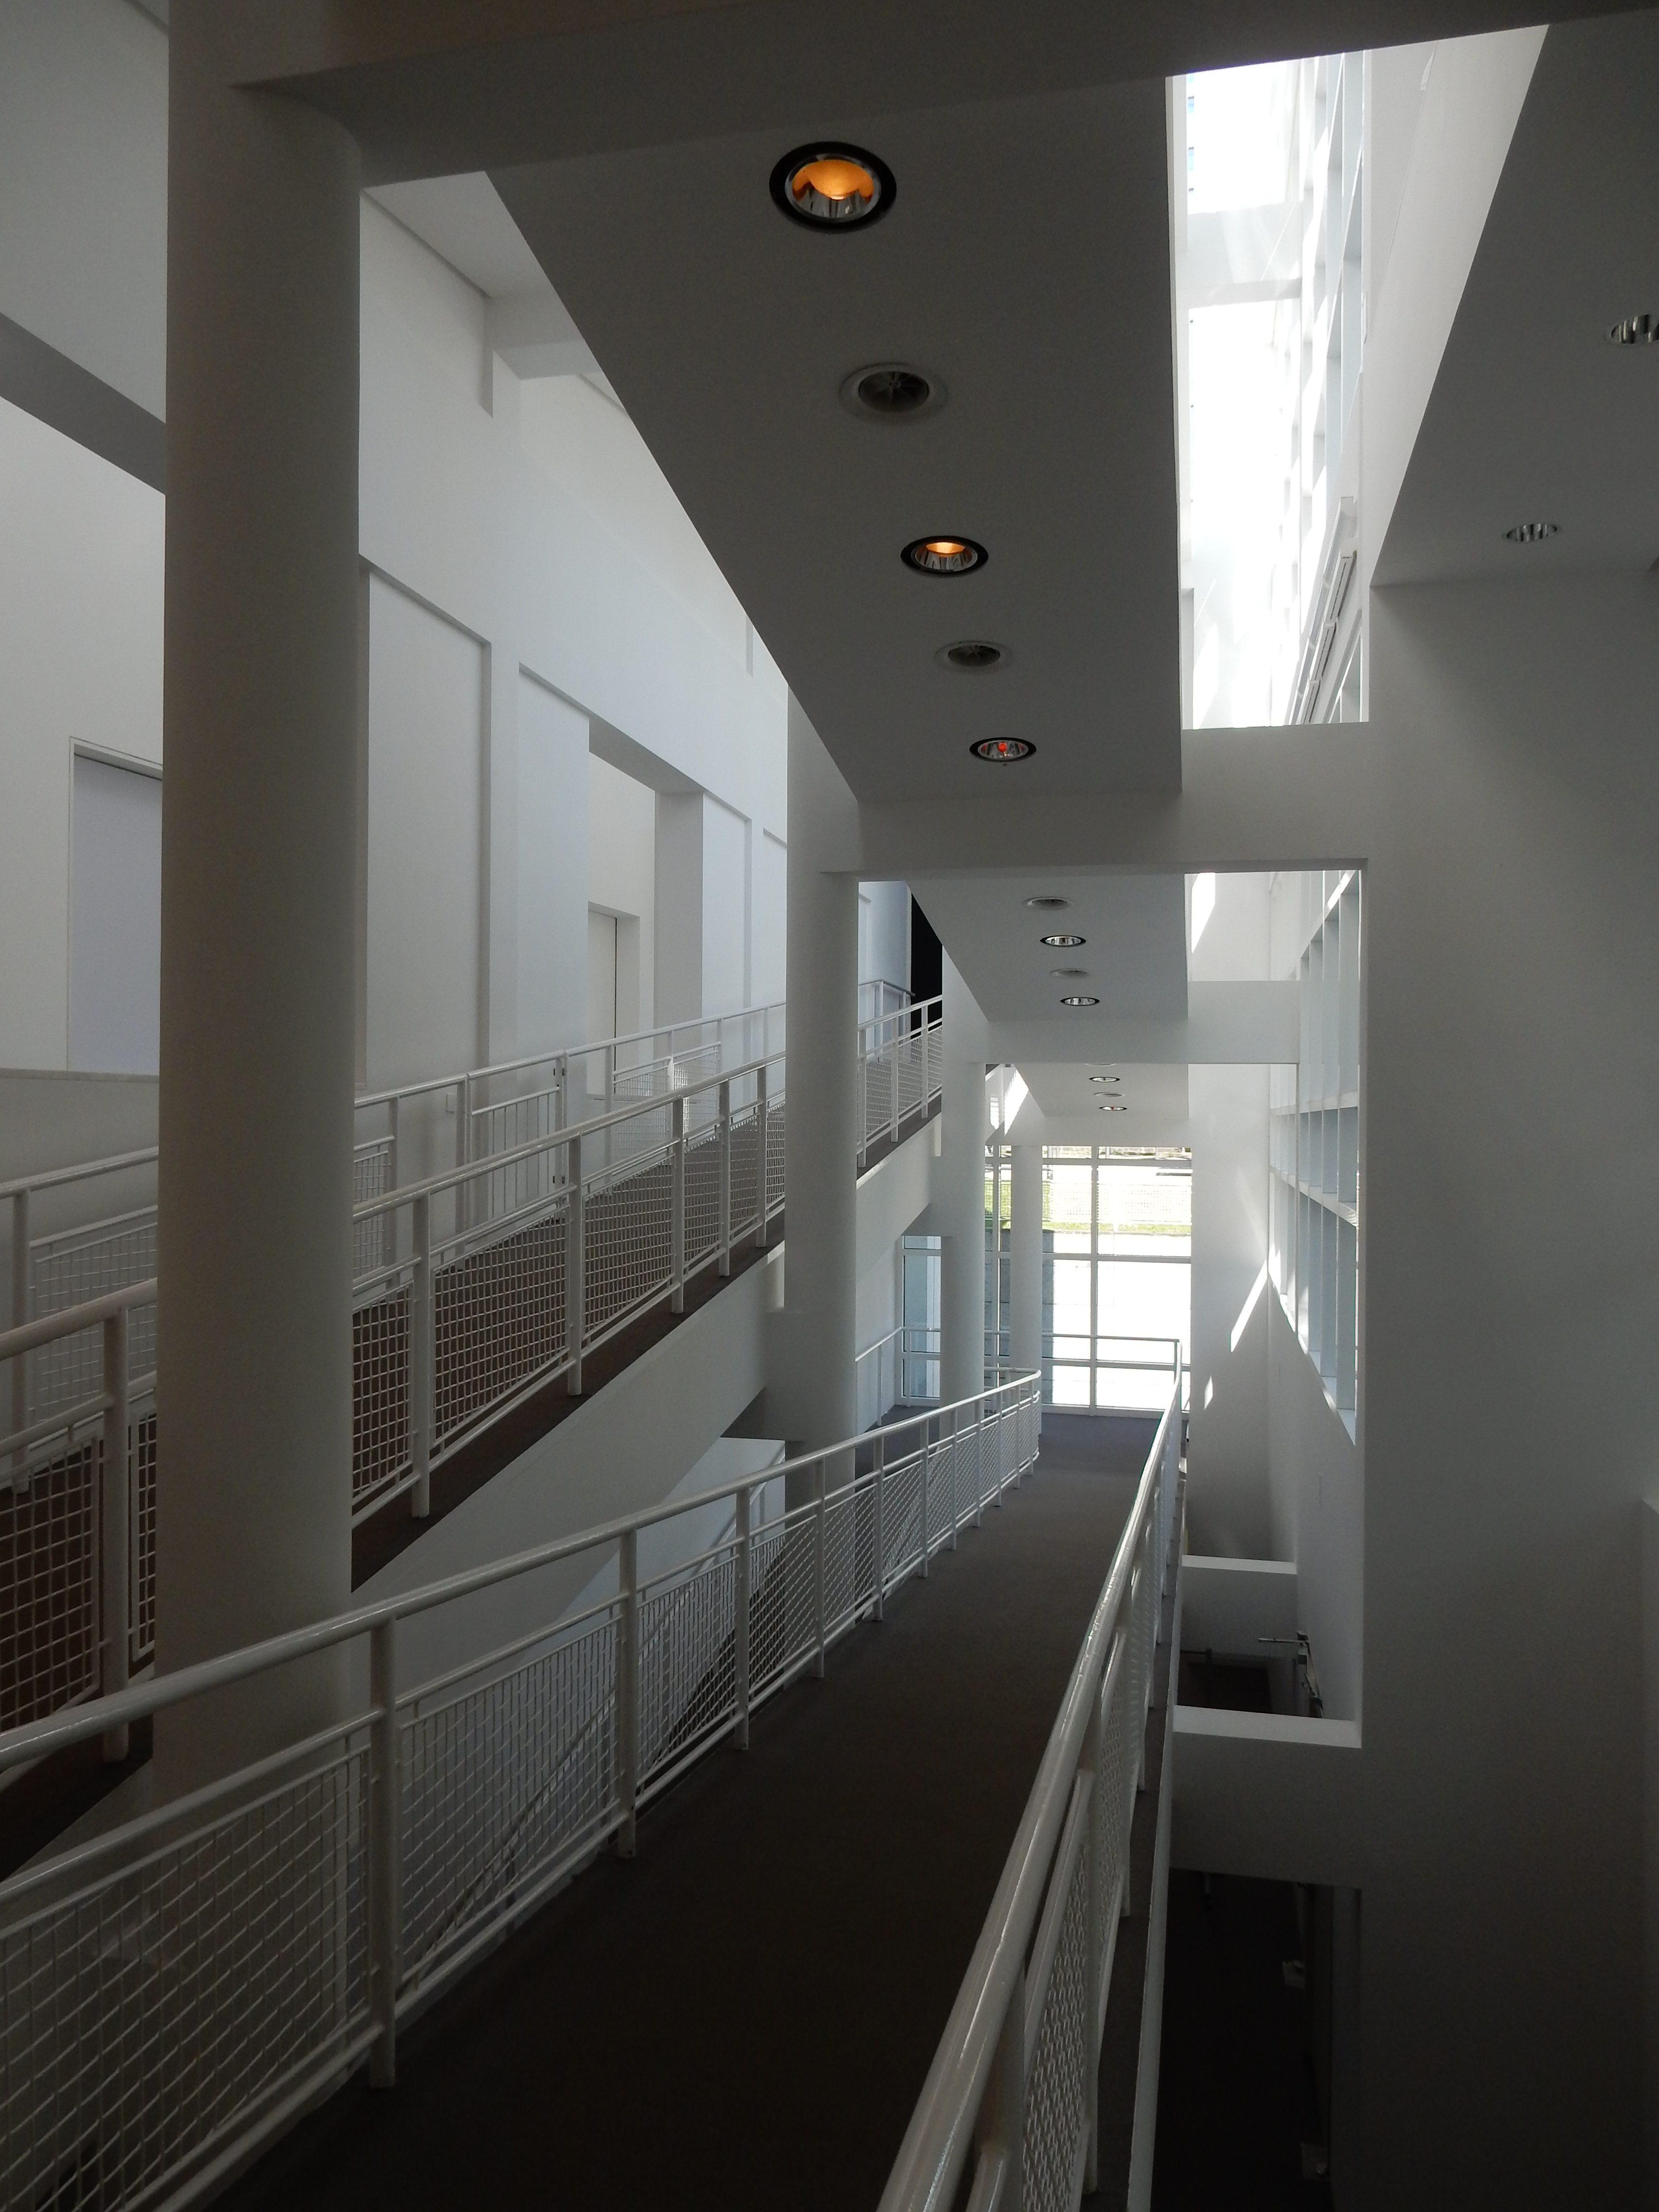 Museum Angewandte Kunst, Frankfurt. Foto Coert Peter Krabbe, mei 2019, interieur